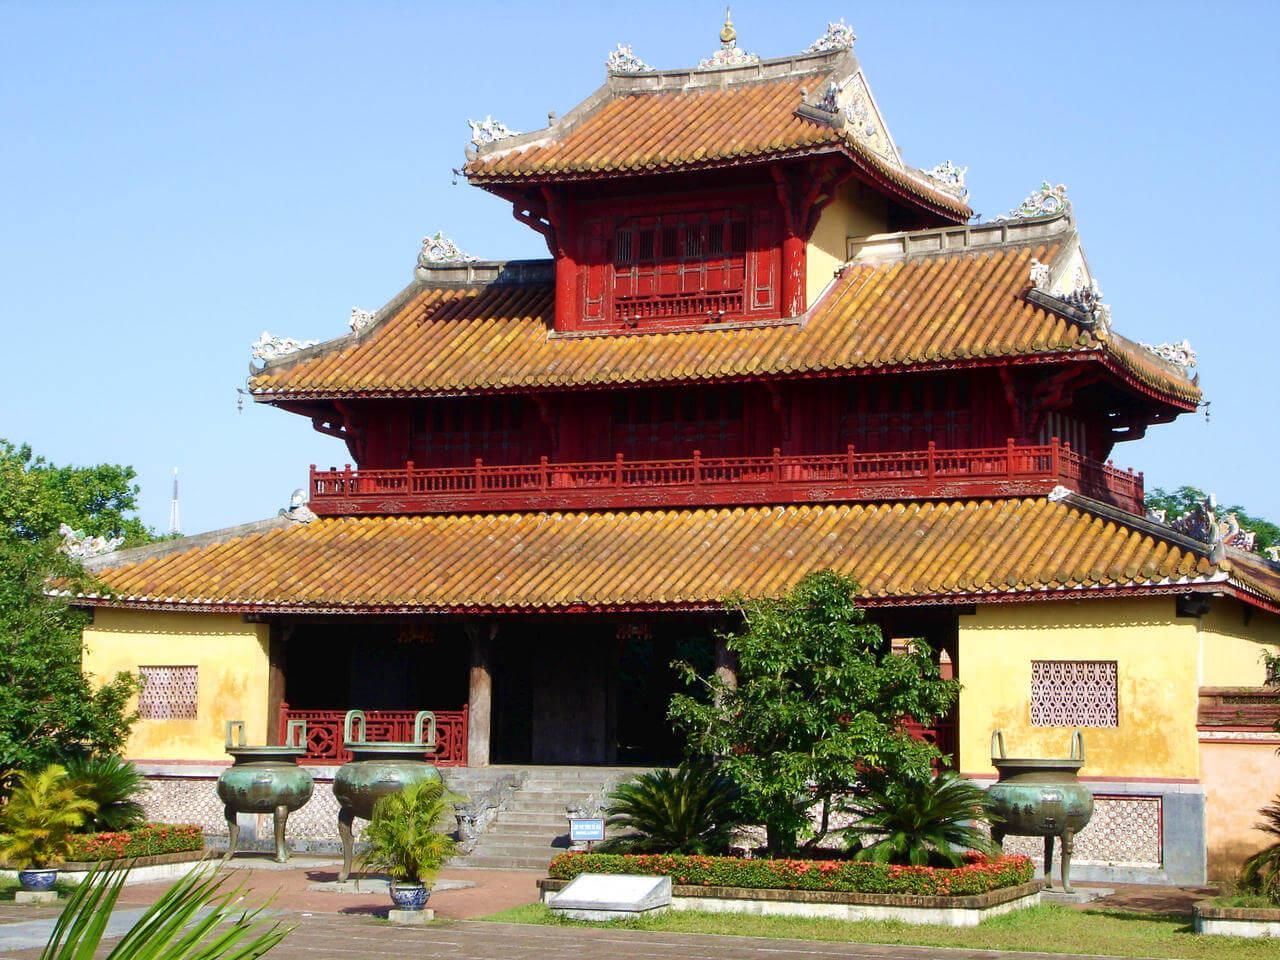 Vietnam temple.